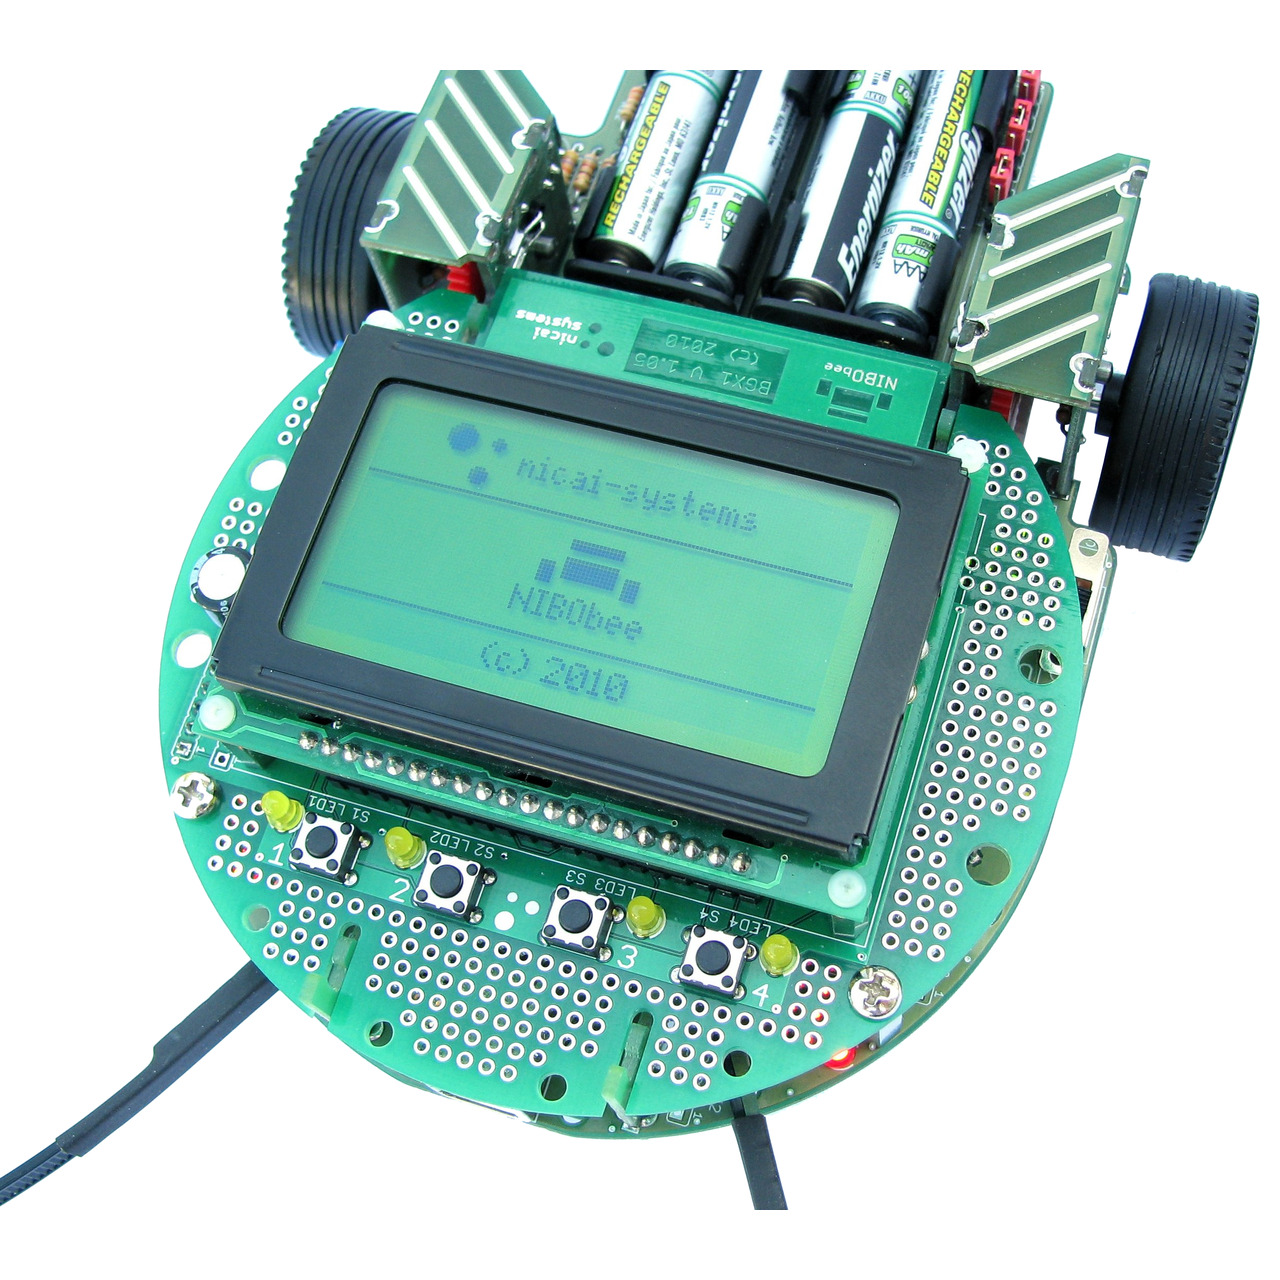 nicai systems Grafik-Display BGX1 Erweiterung fund-252 r NIBObee